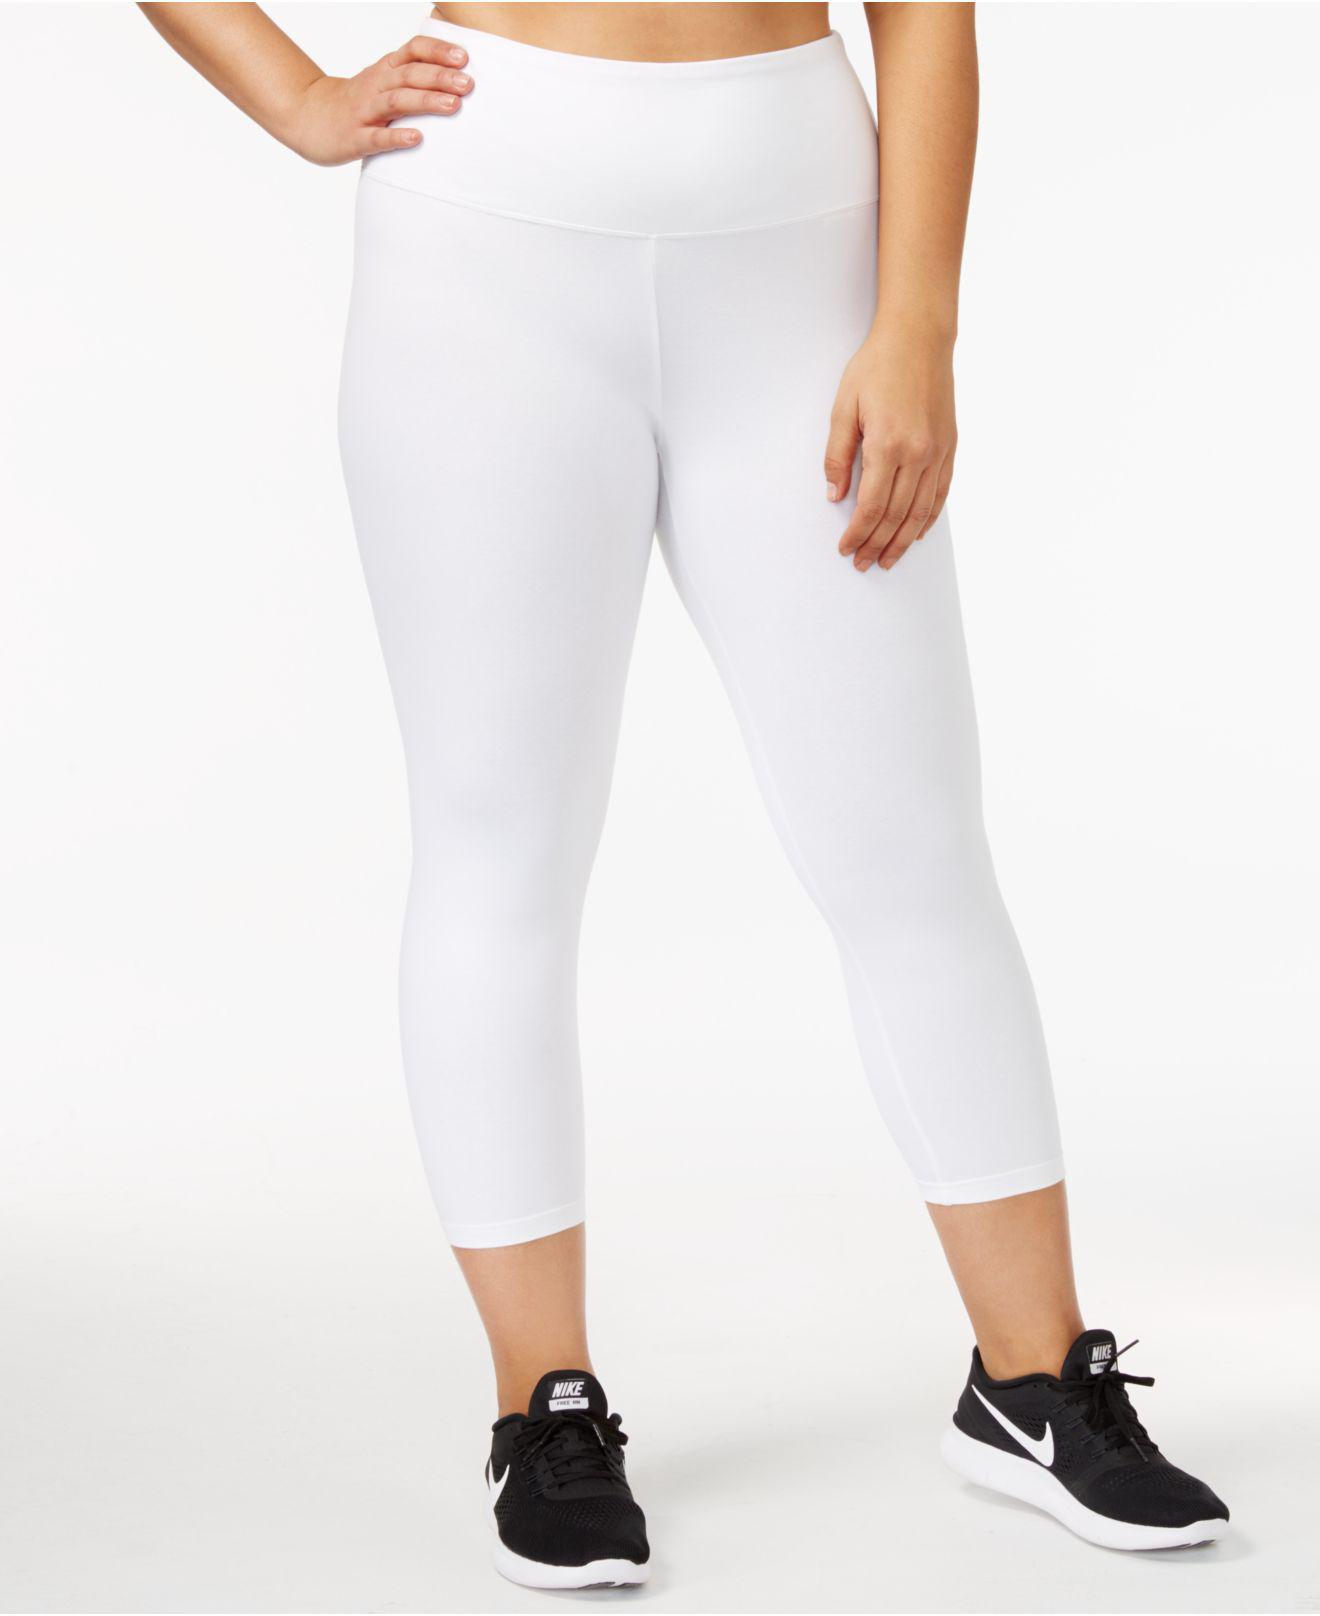 760dbb3769d01 Style & Co. Plus Size Tummy Control Yoga Leggings in White - Lyst